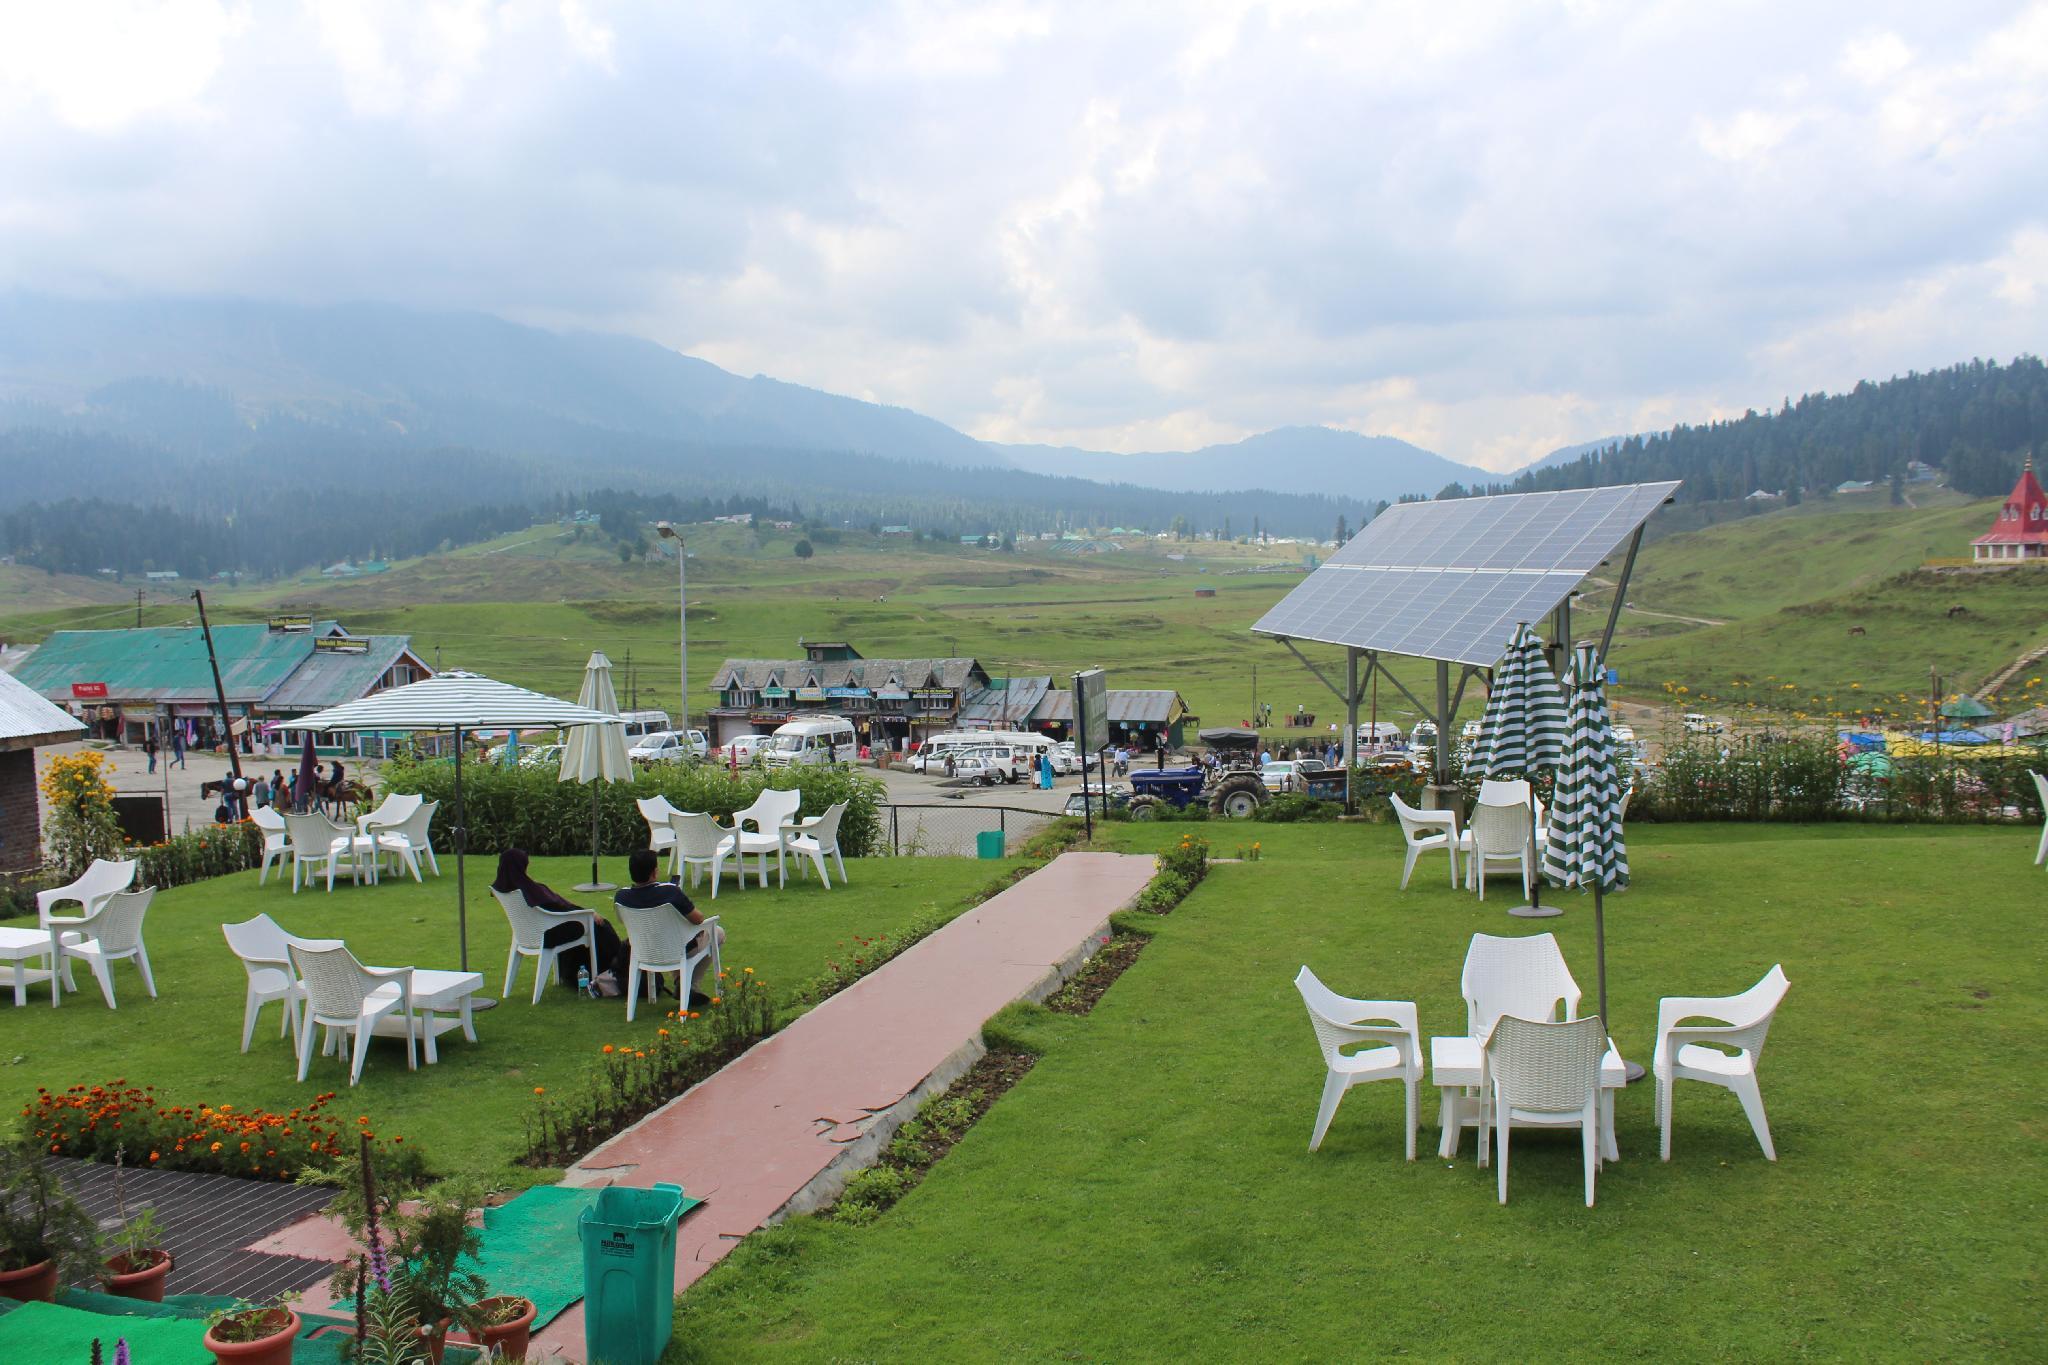 Pine View Resort - Gulmarg, Baramulla